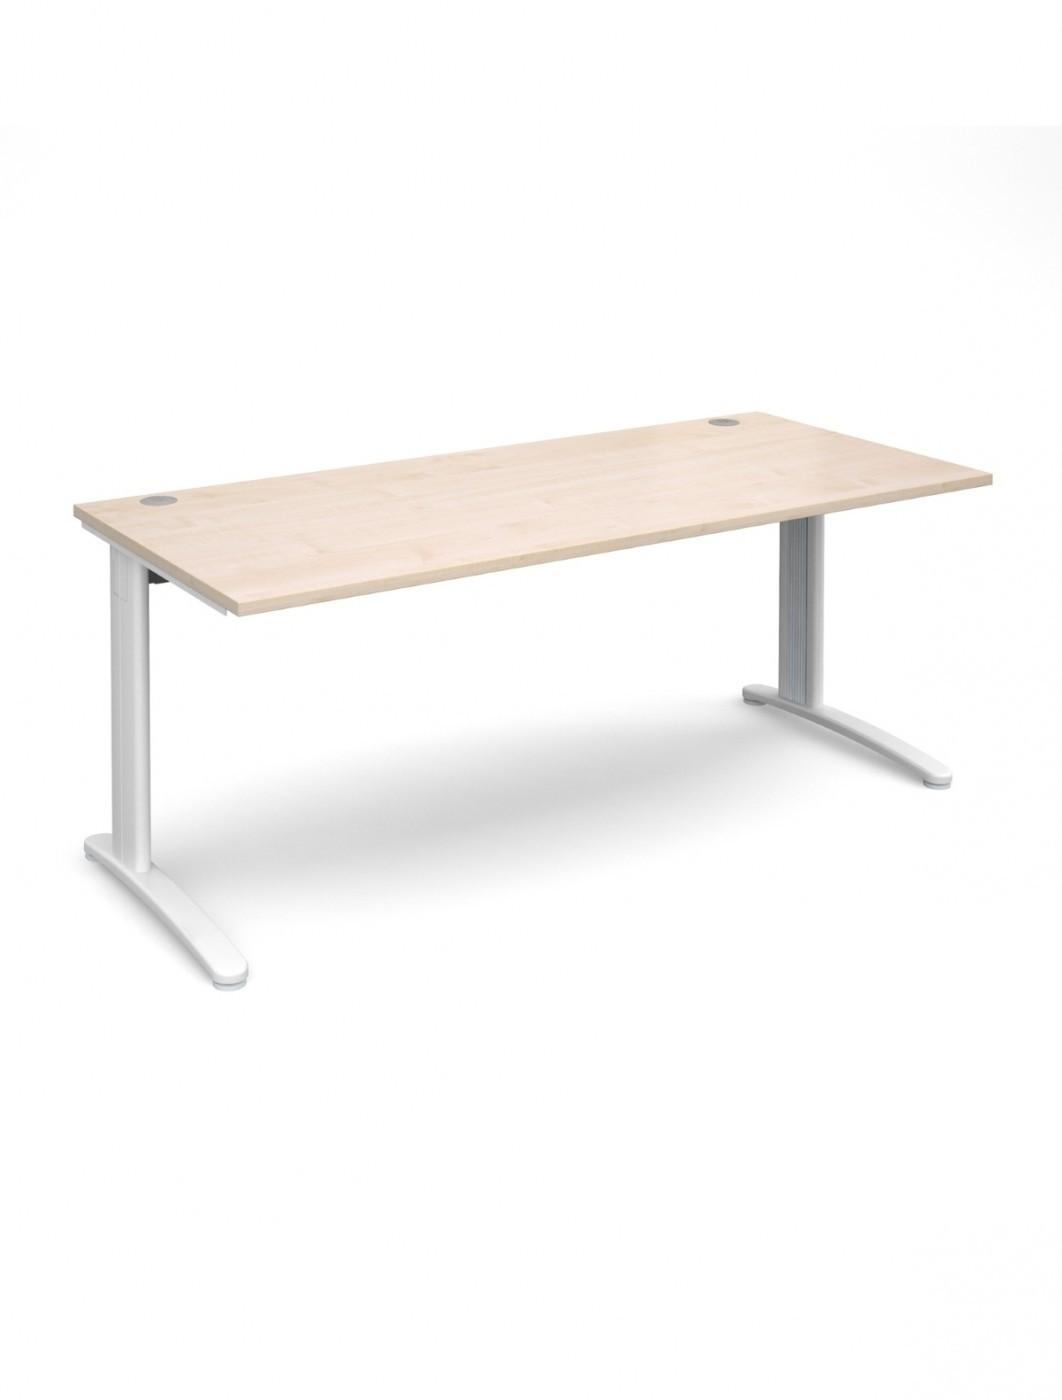 Home Office Furniture Uk Desk Set 18: Maple Office Desk 1800x800mm Dams TR10 Desk T18M